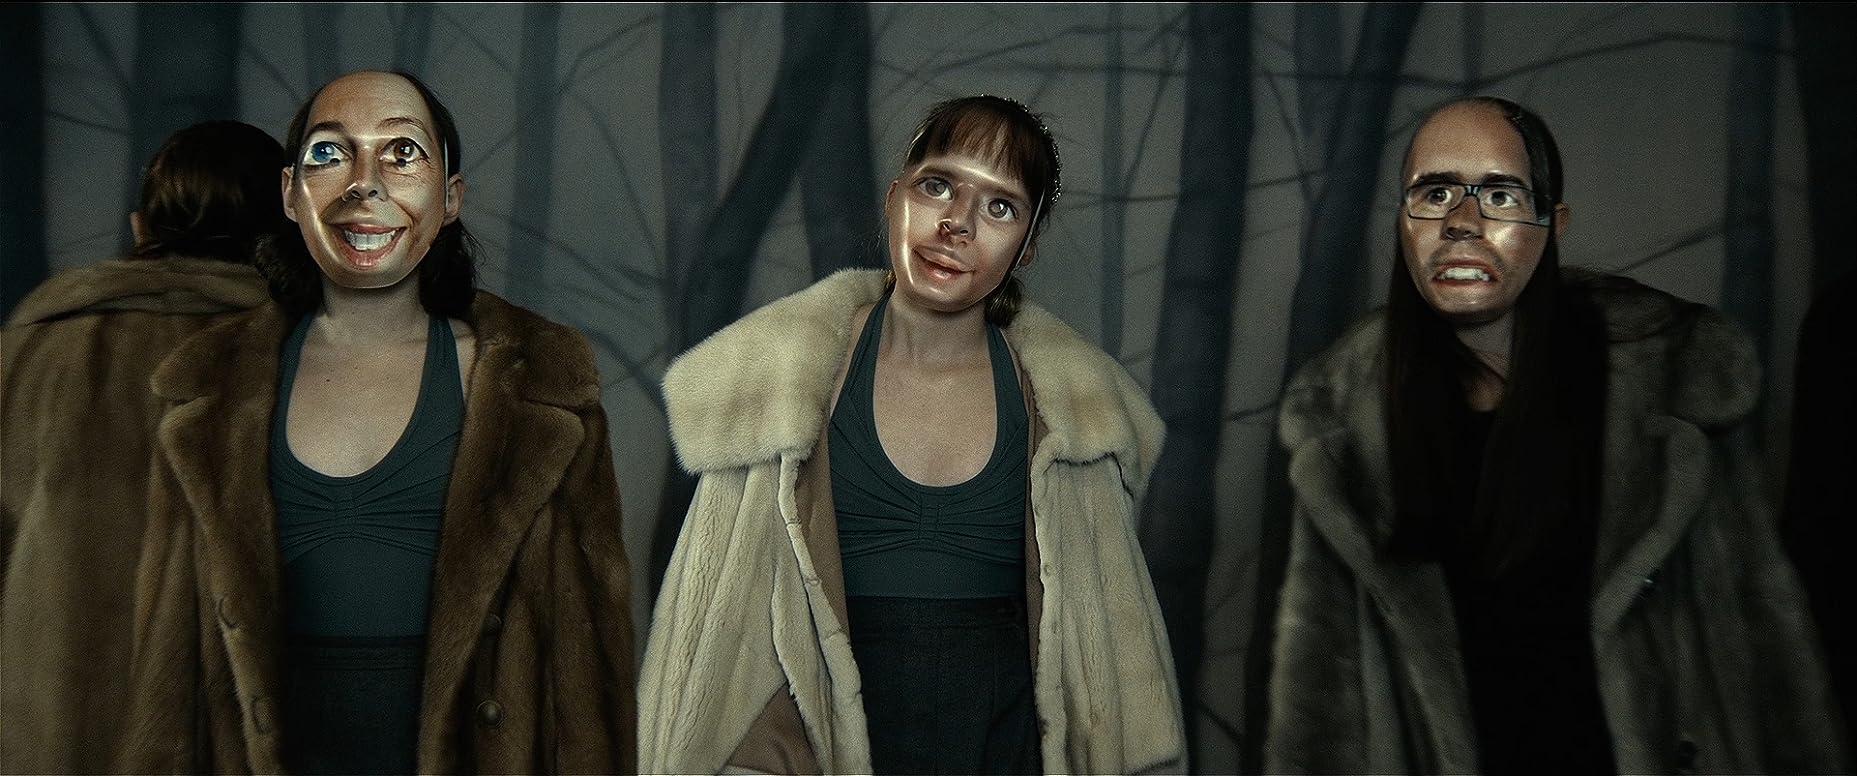 IFC Midnight's #Horror - Trailer 2